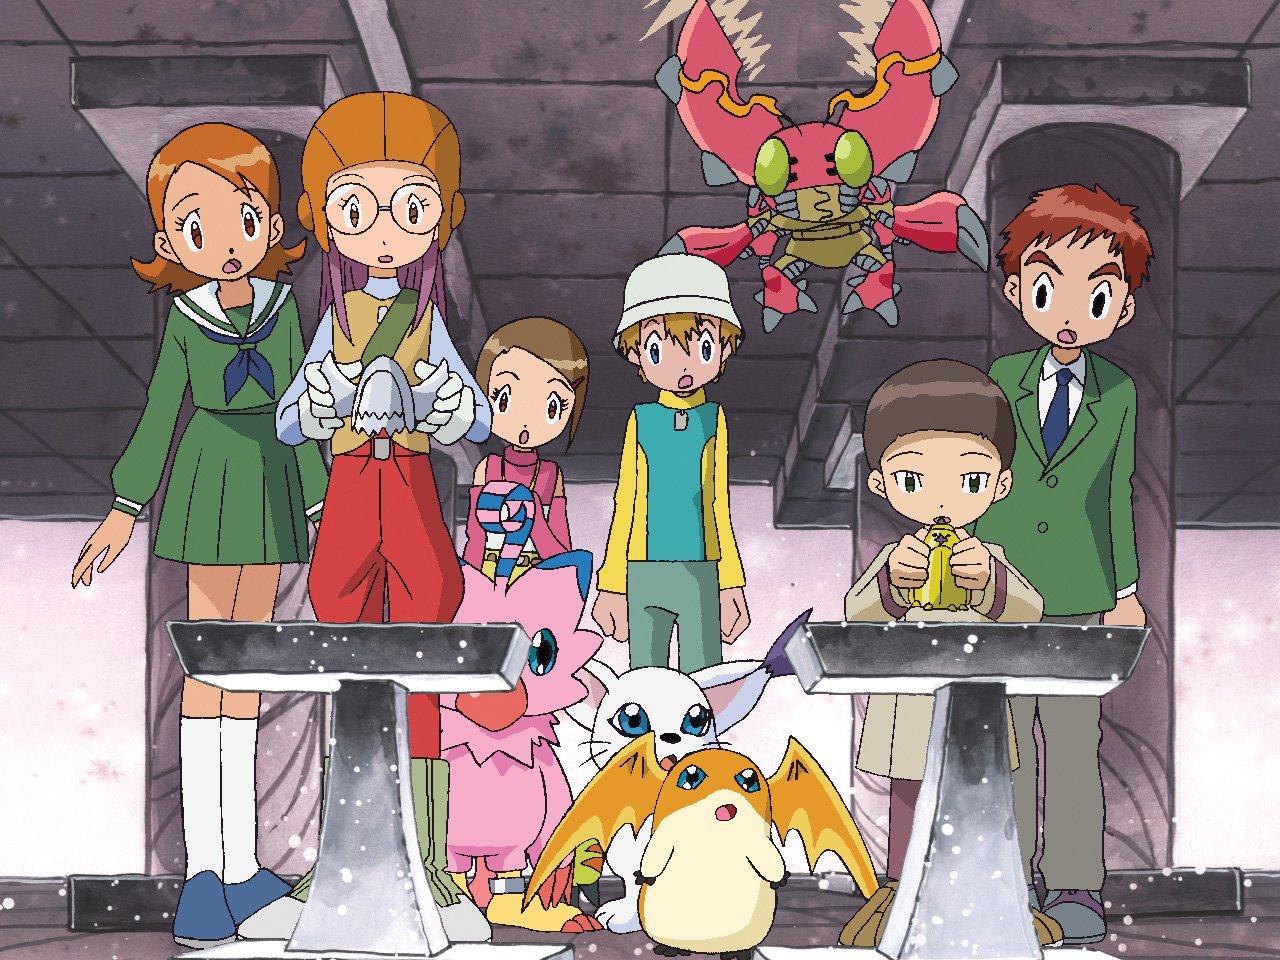 Digimon 02 capitulo 51 completo latino dating